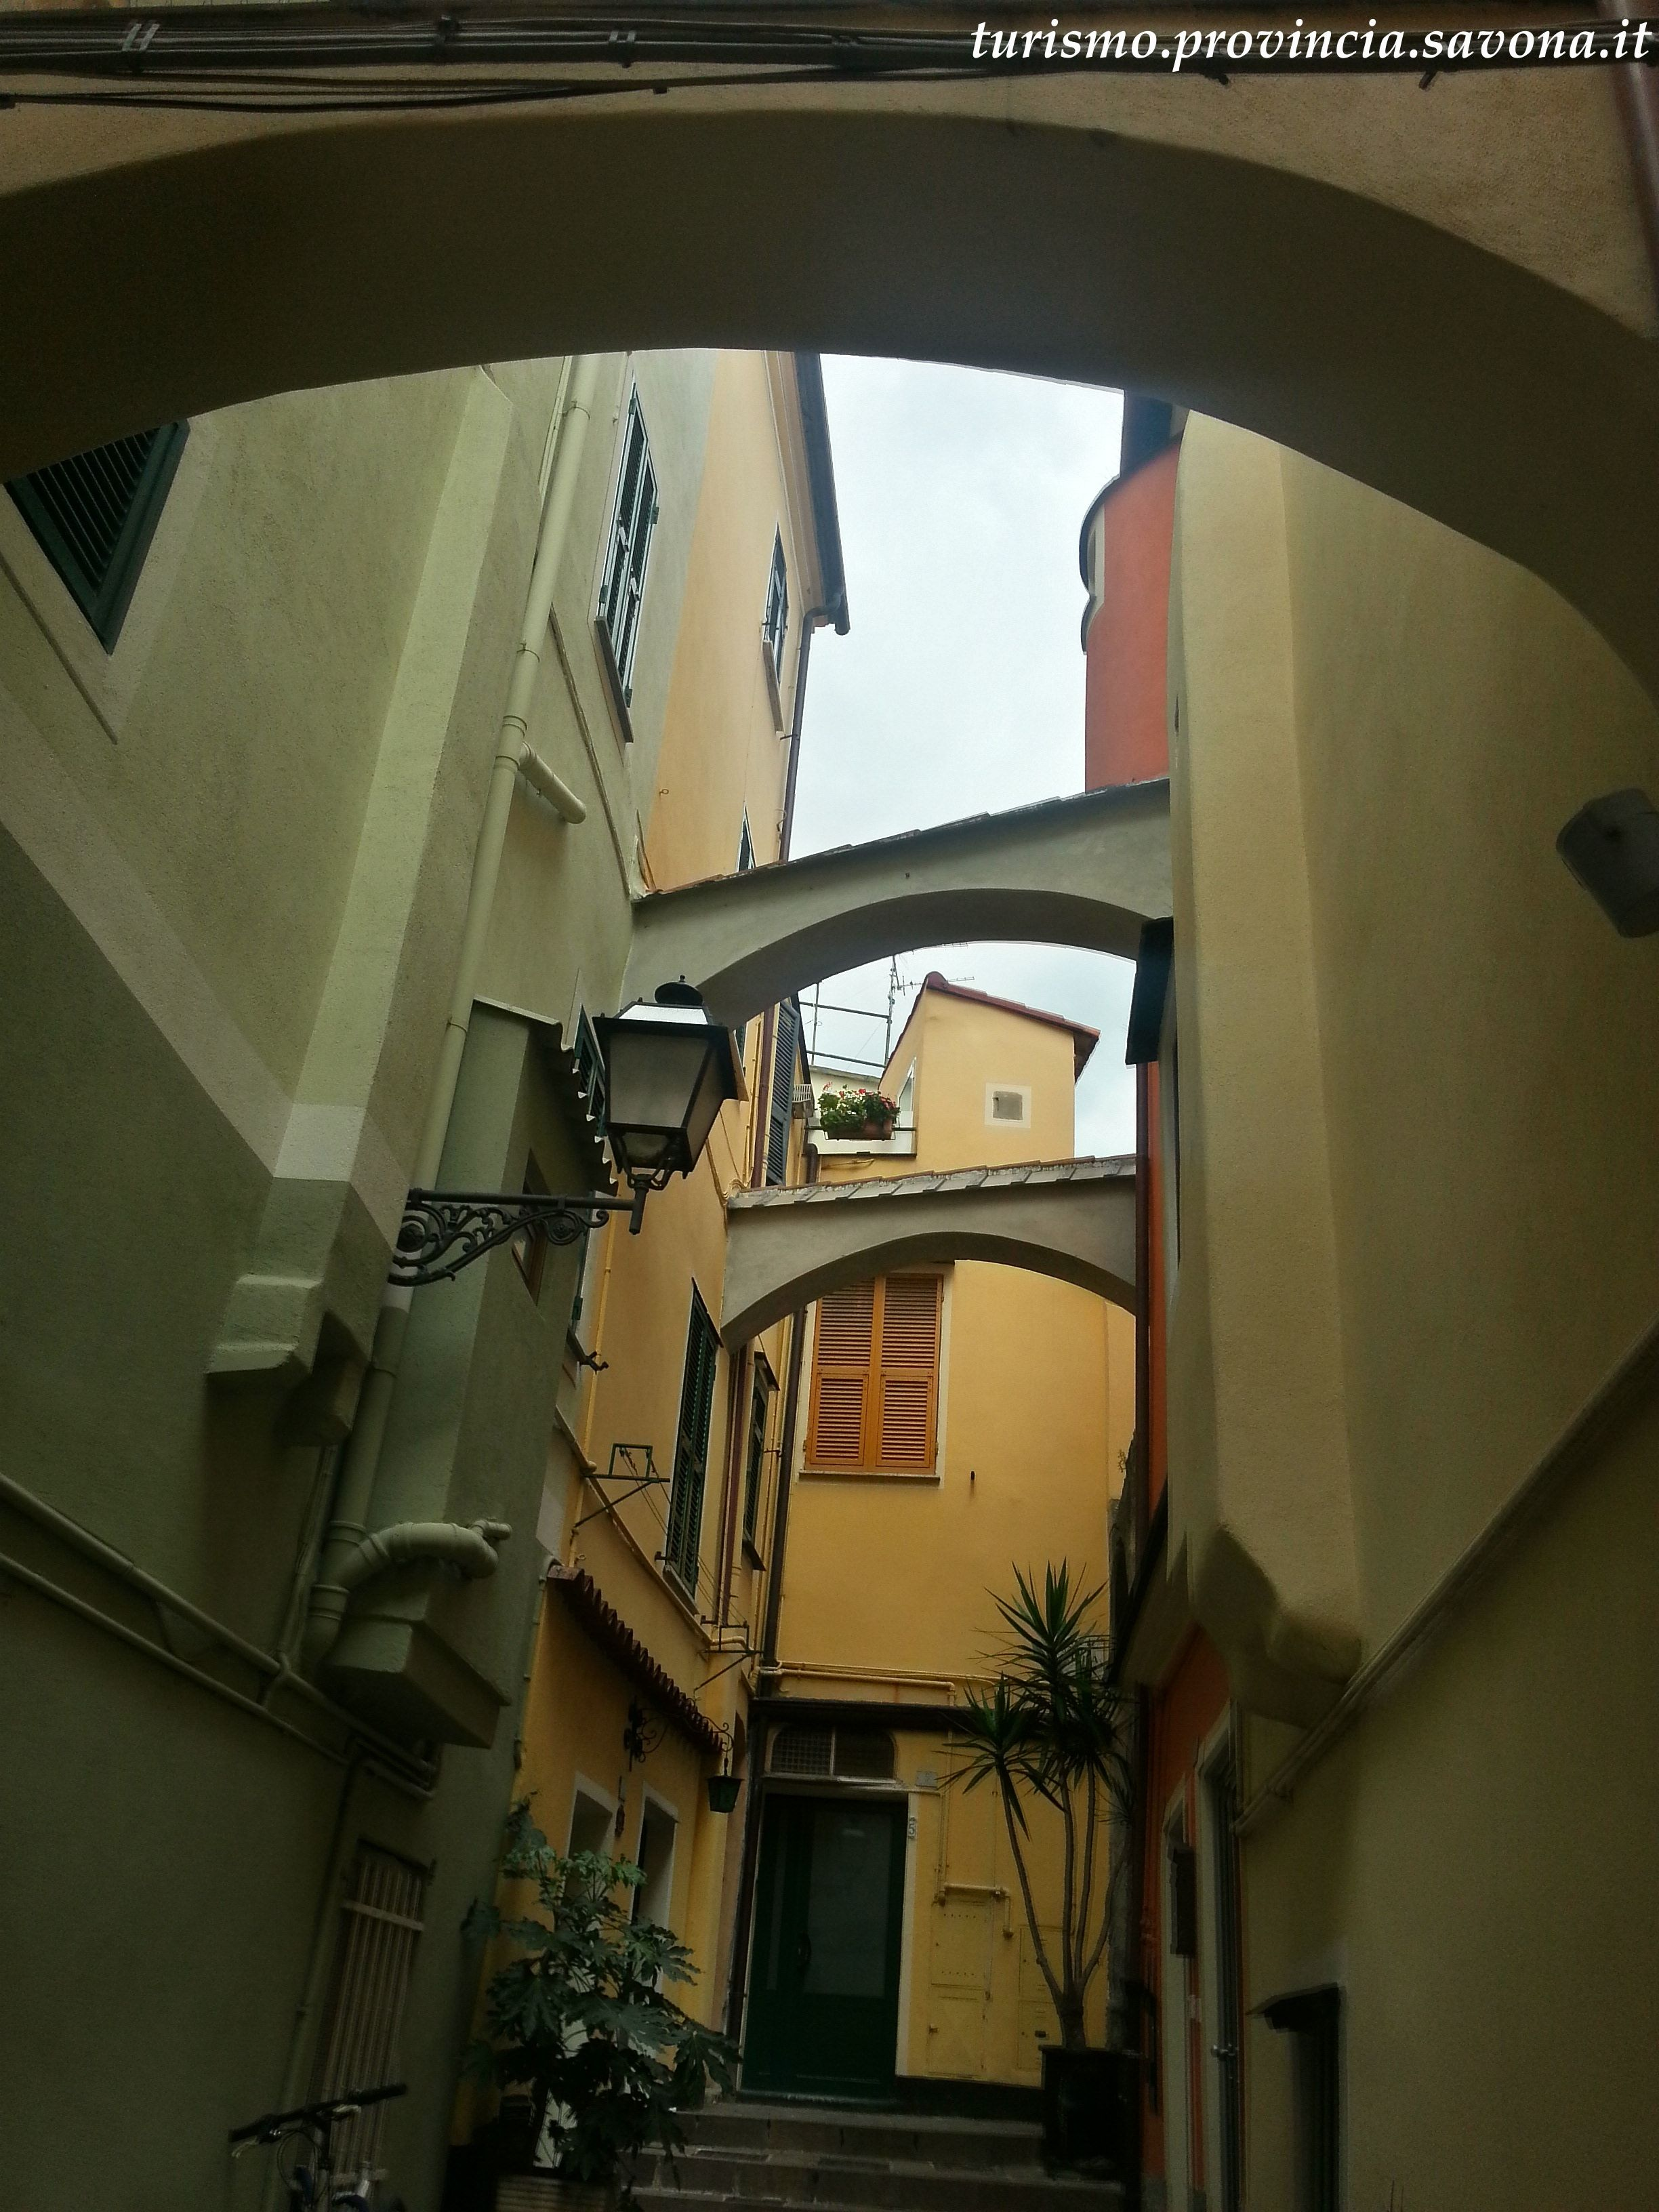 Scorcio di salita Santa Caterina Pietra Ligura